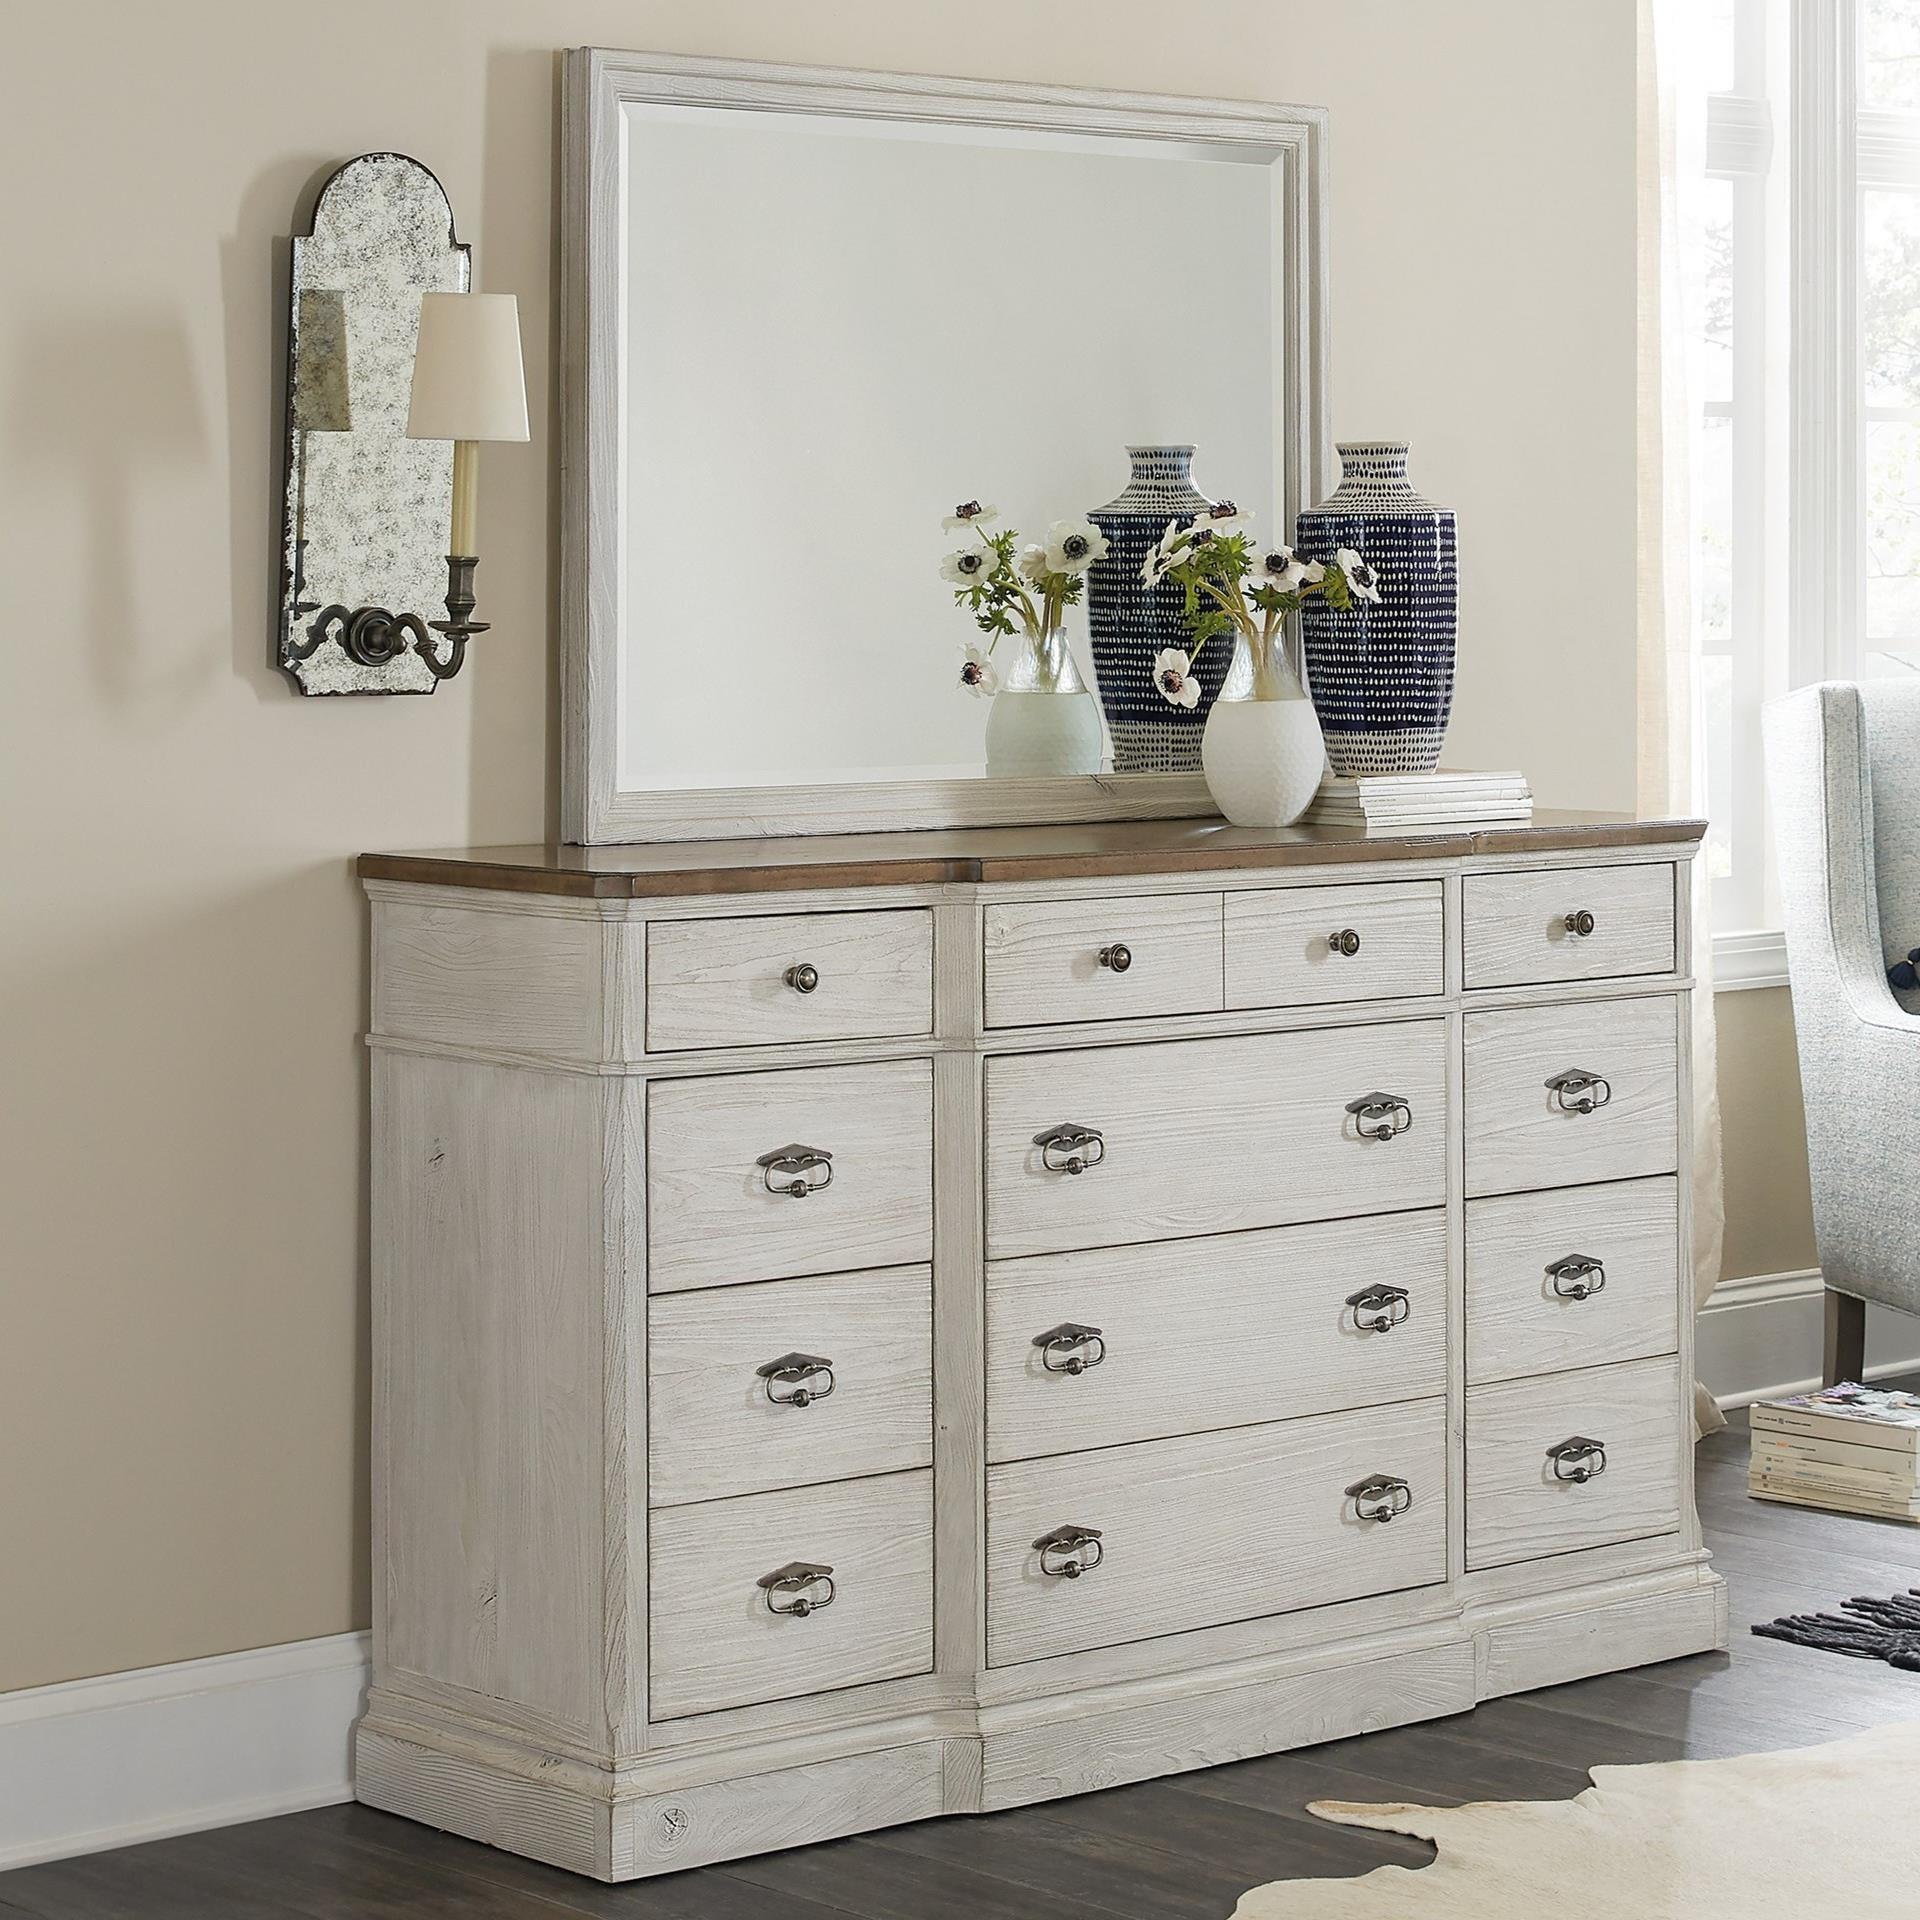 Montebello Dresser + Mirror Set by Hooker Furniture at Baer's Furniture